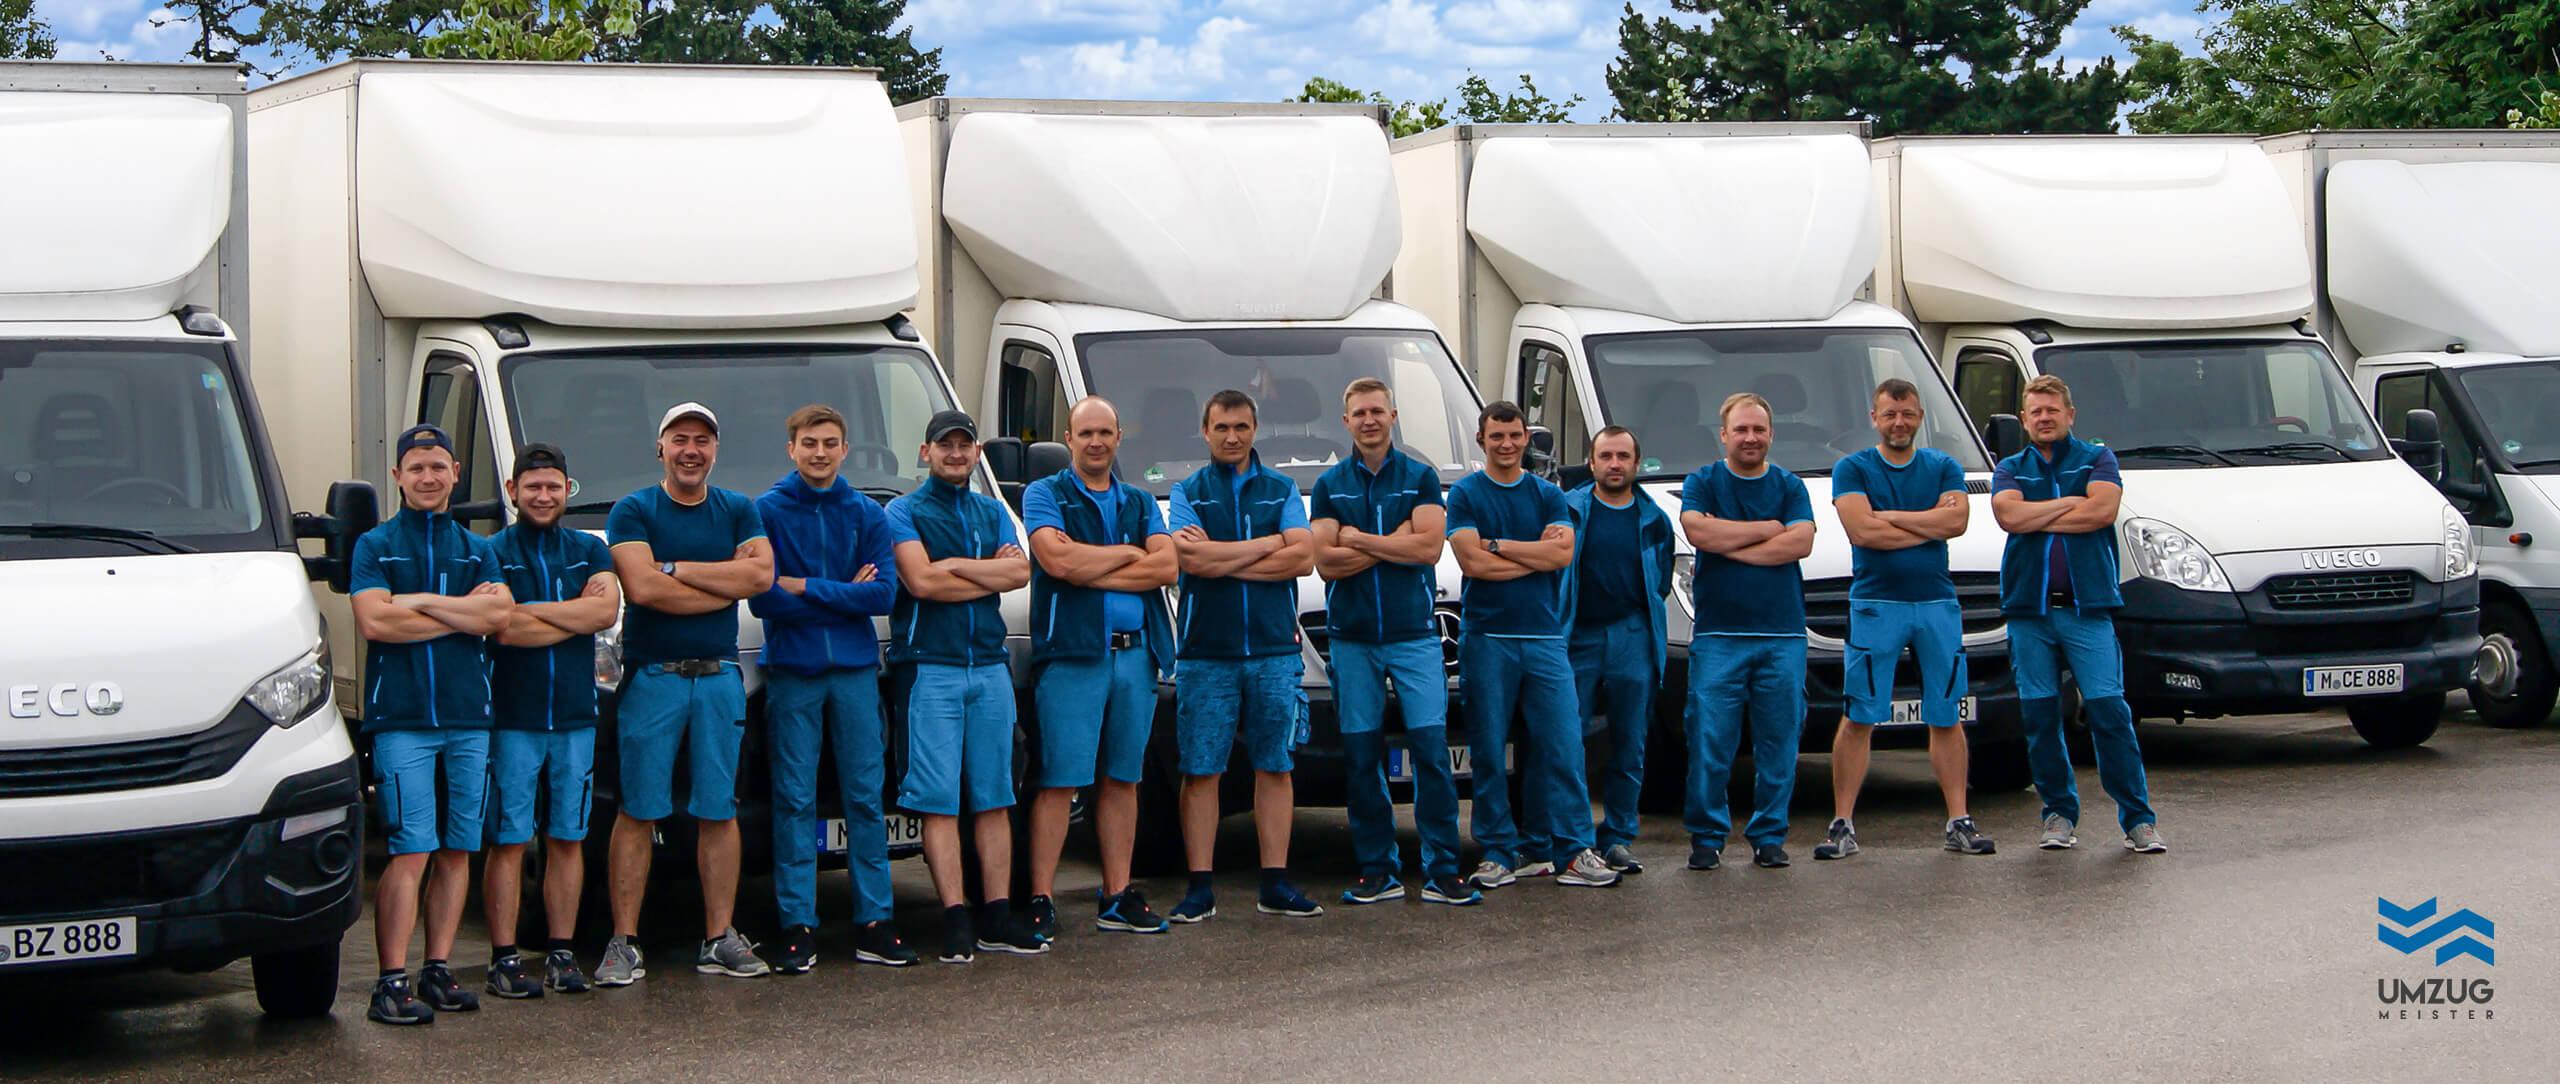 Umzug München - Teamfoto